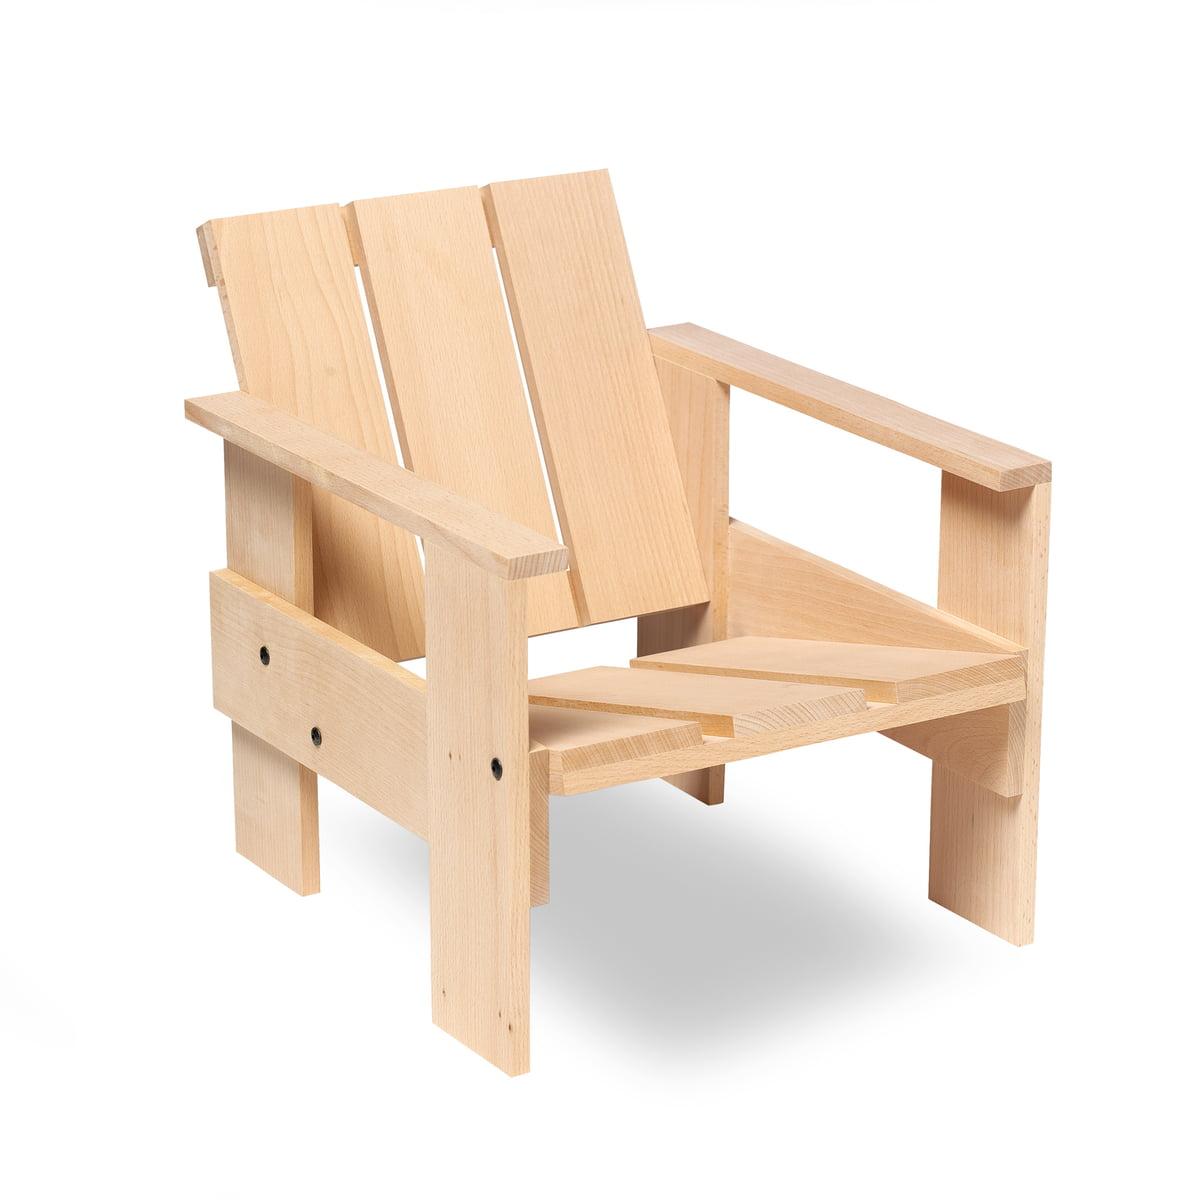 Gerrit rietveld furniture - Spectrum Gerrit Rietveld Junior Crate Chair Natural